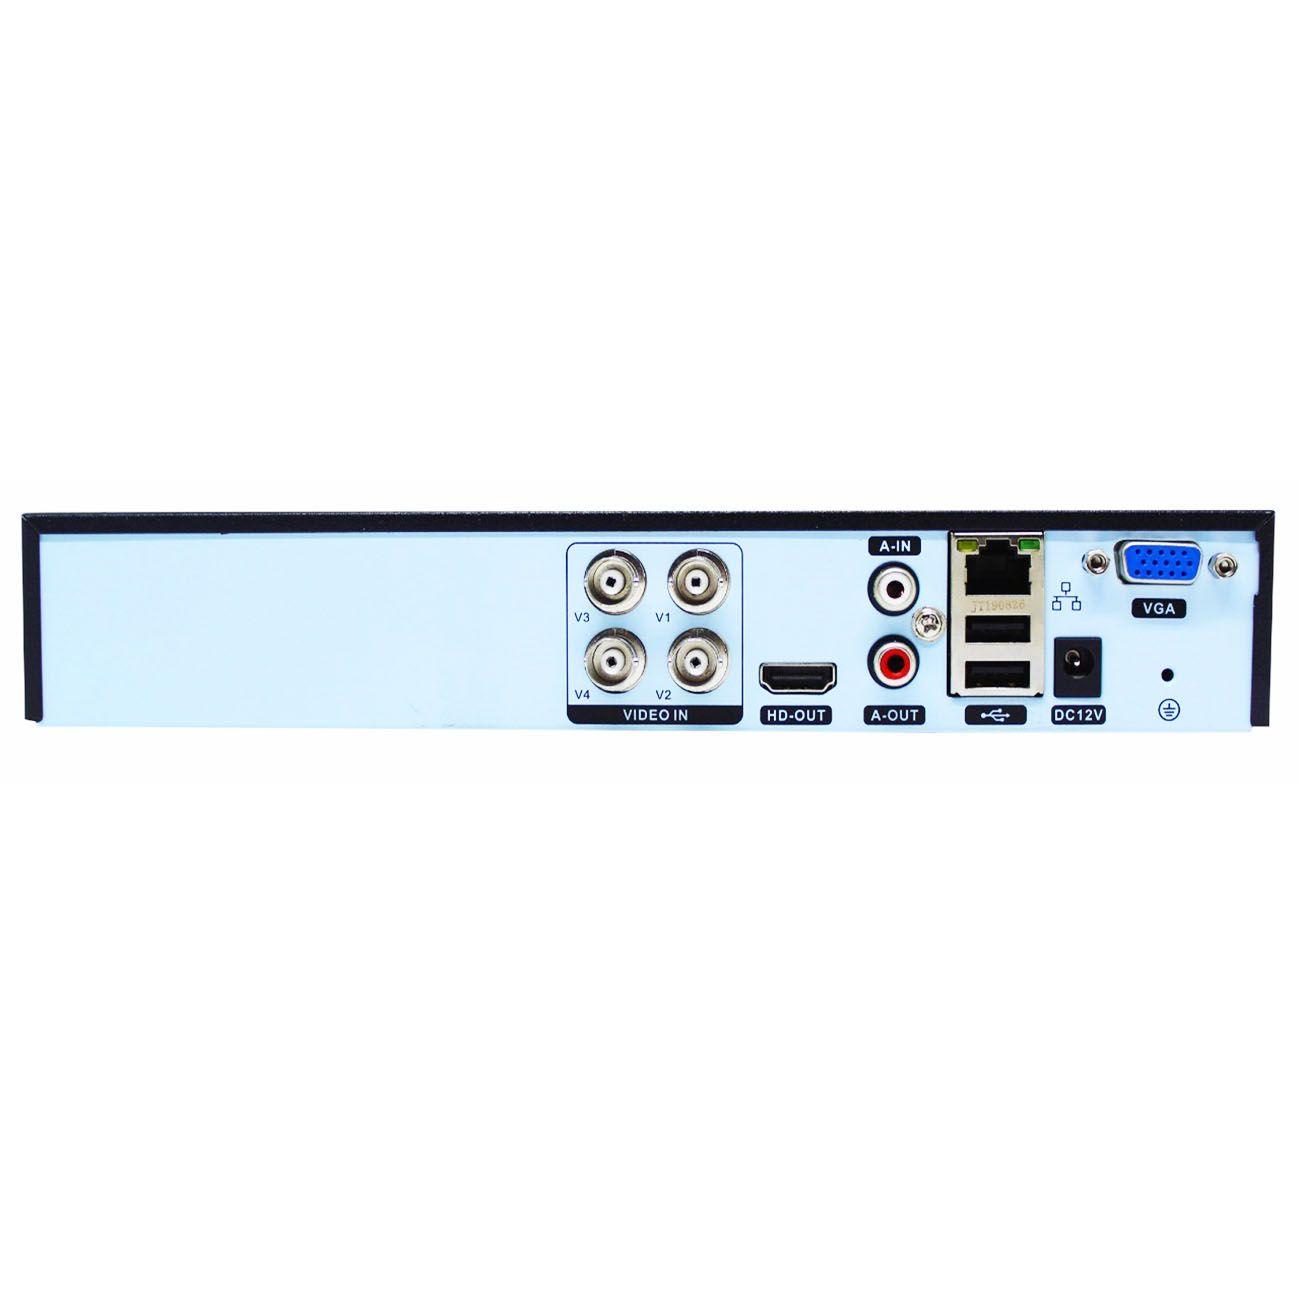 Kit 2 Câmeras de Segurança IP Full HD 1080p Wifi PTZ + DVR/NVR 4CH Pentaflex + HD 500Gb